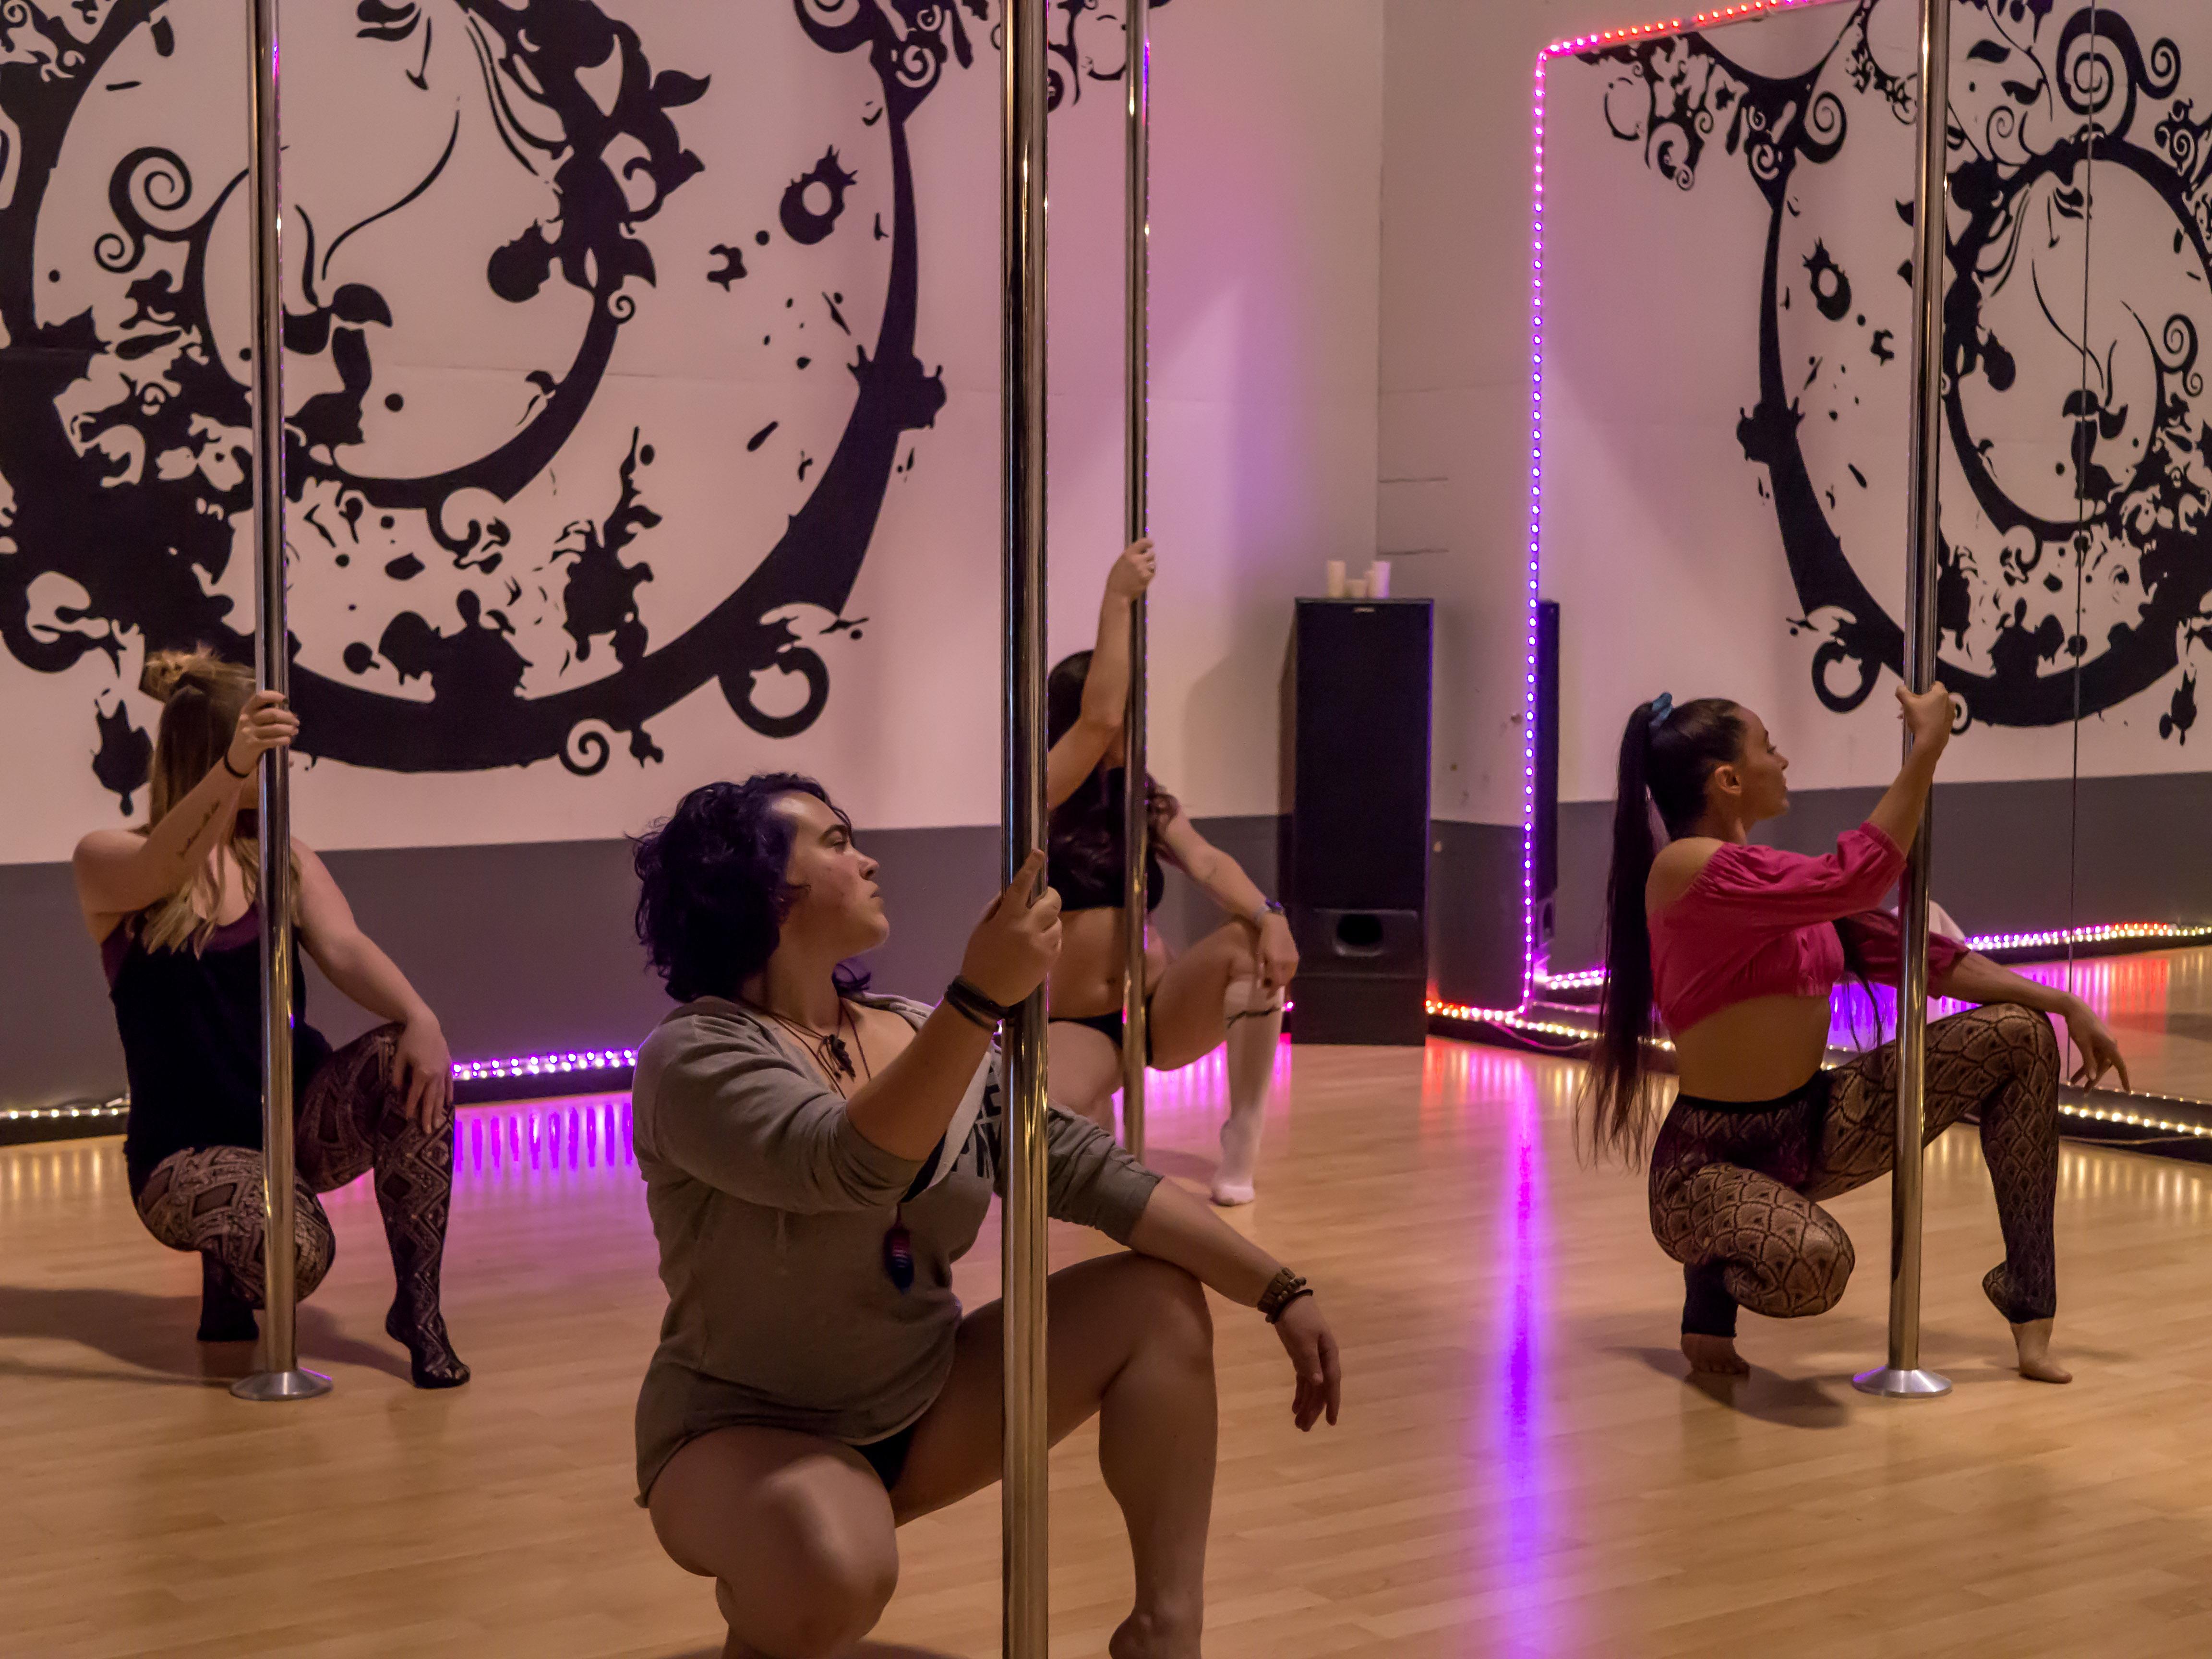 Pole Dance & Fitness Rogue Valley - Sexy Floor Work